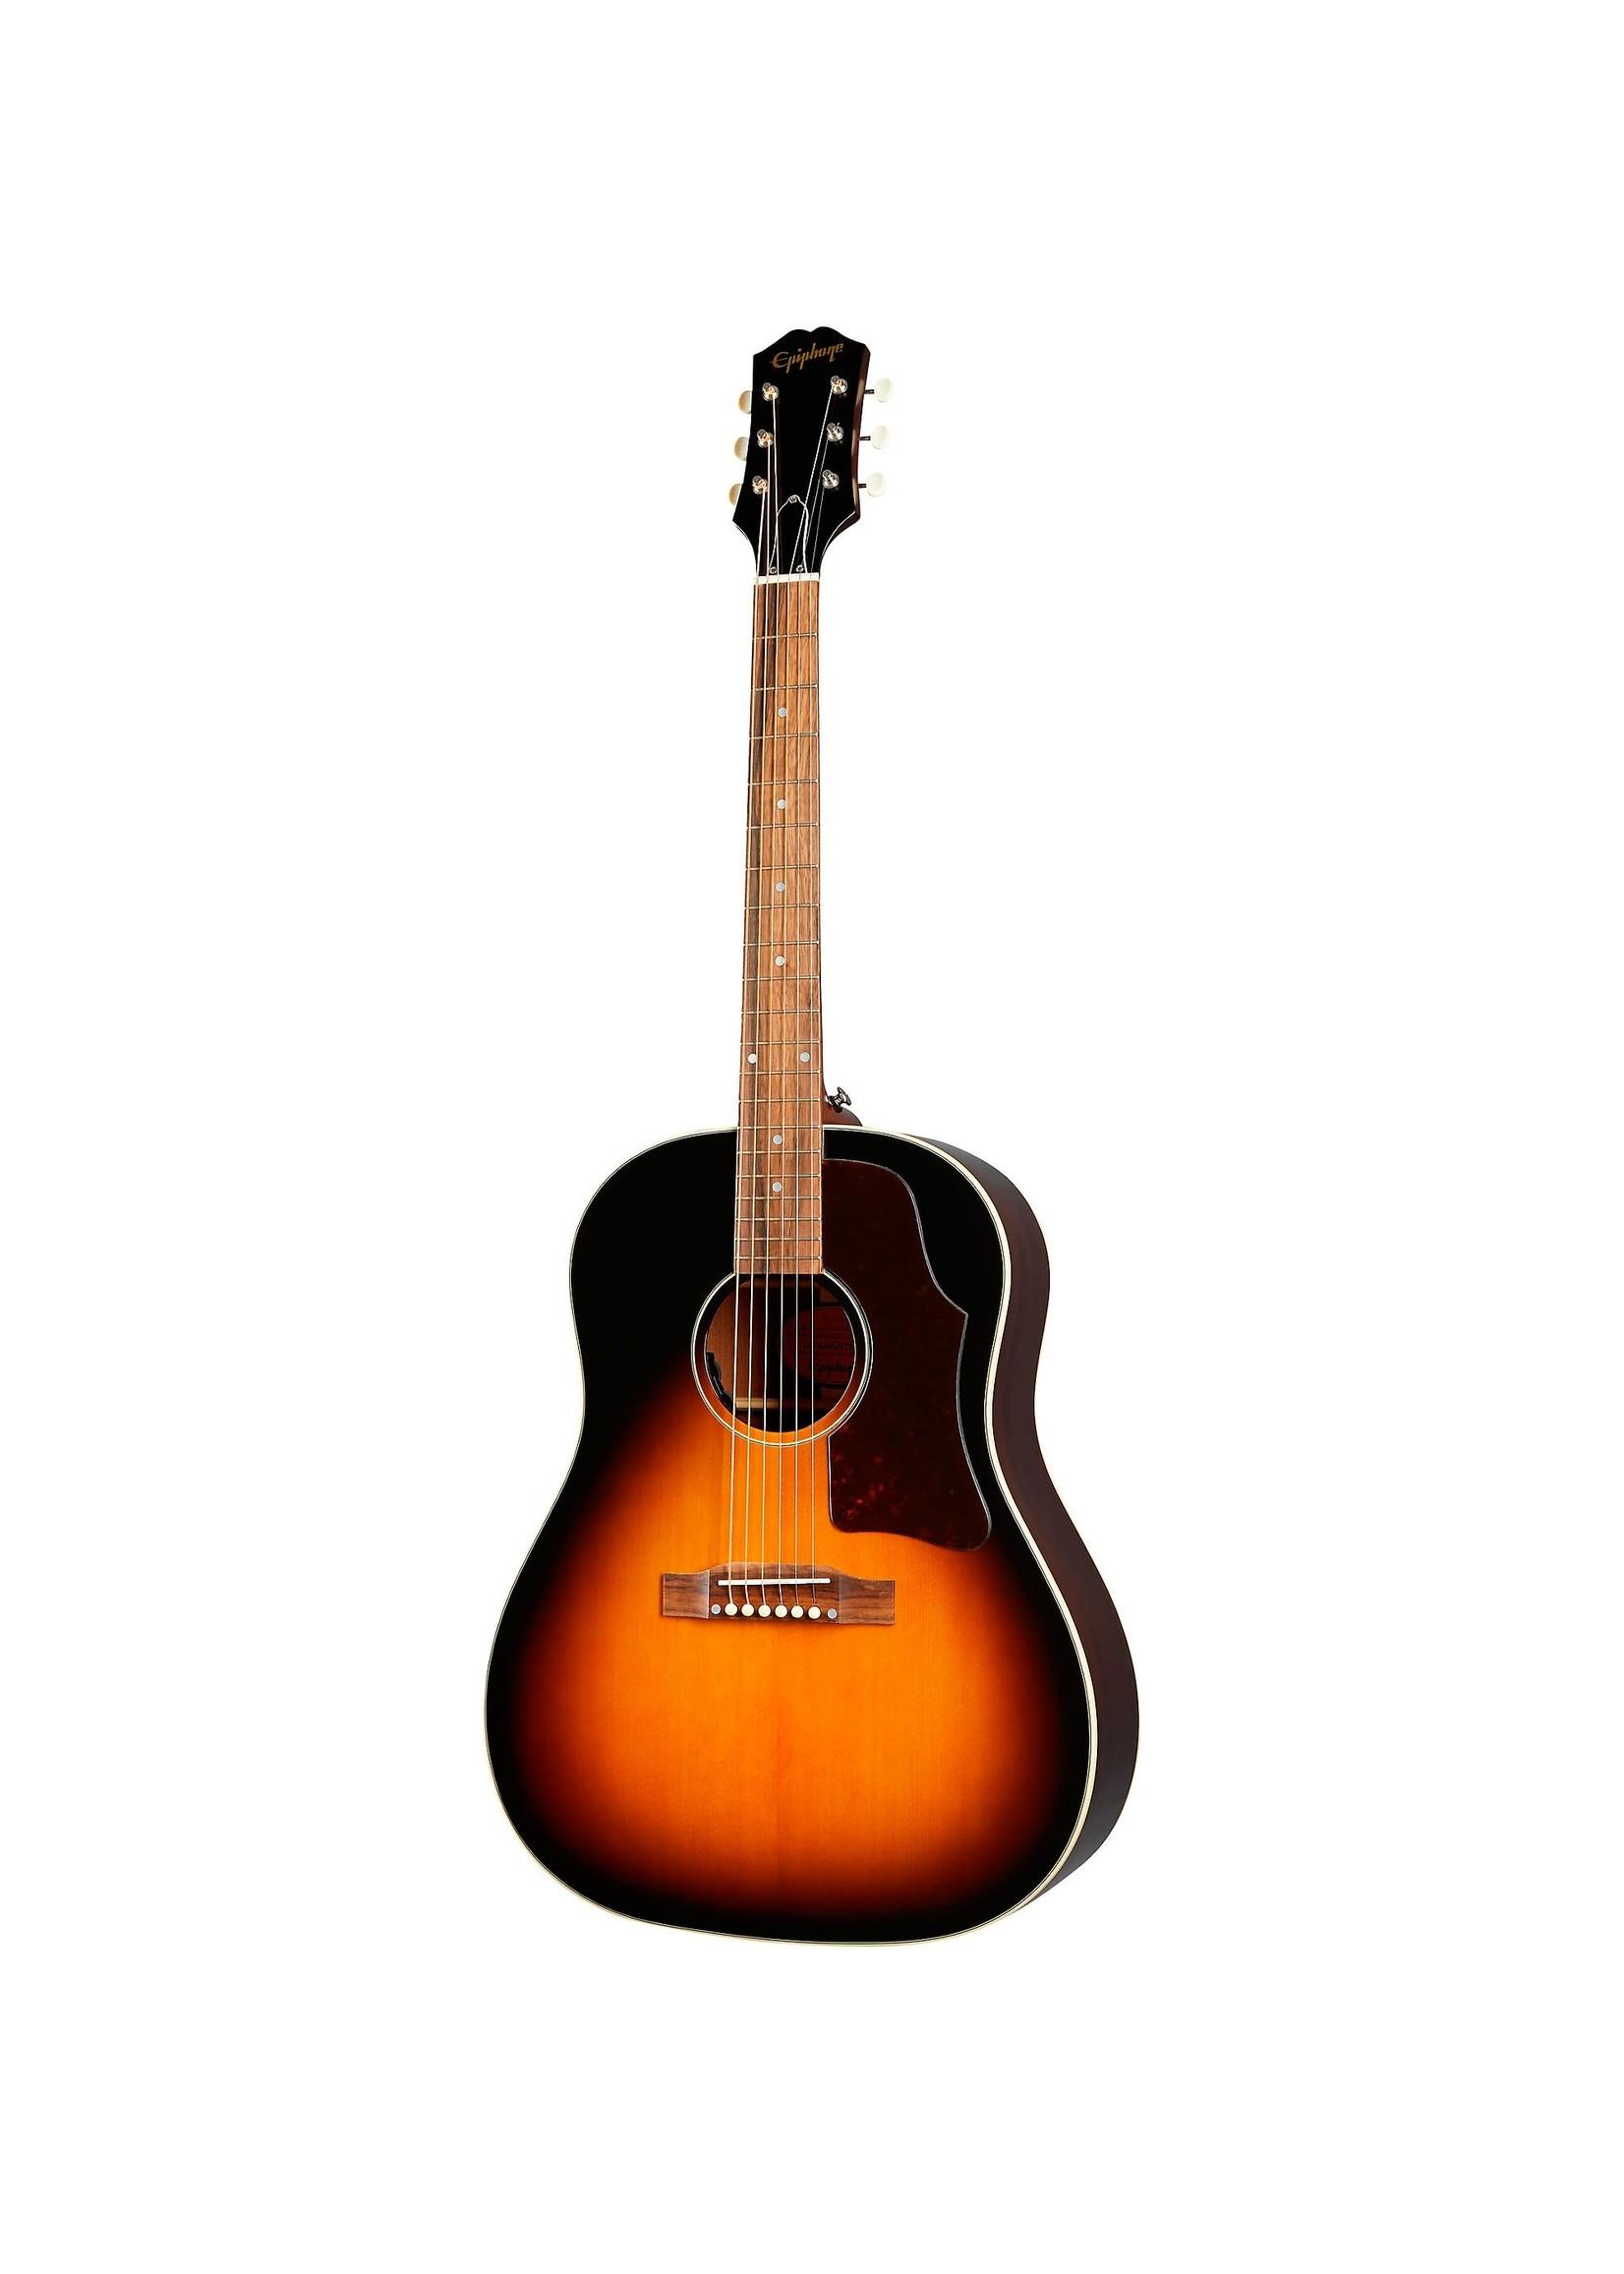 Epiphone Epiphone Masterbilt J-45 Acoustic Electric Guitar Aged Vintage Sunburst Gloss